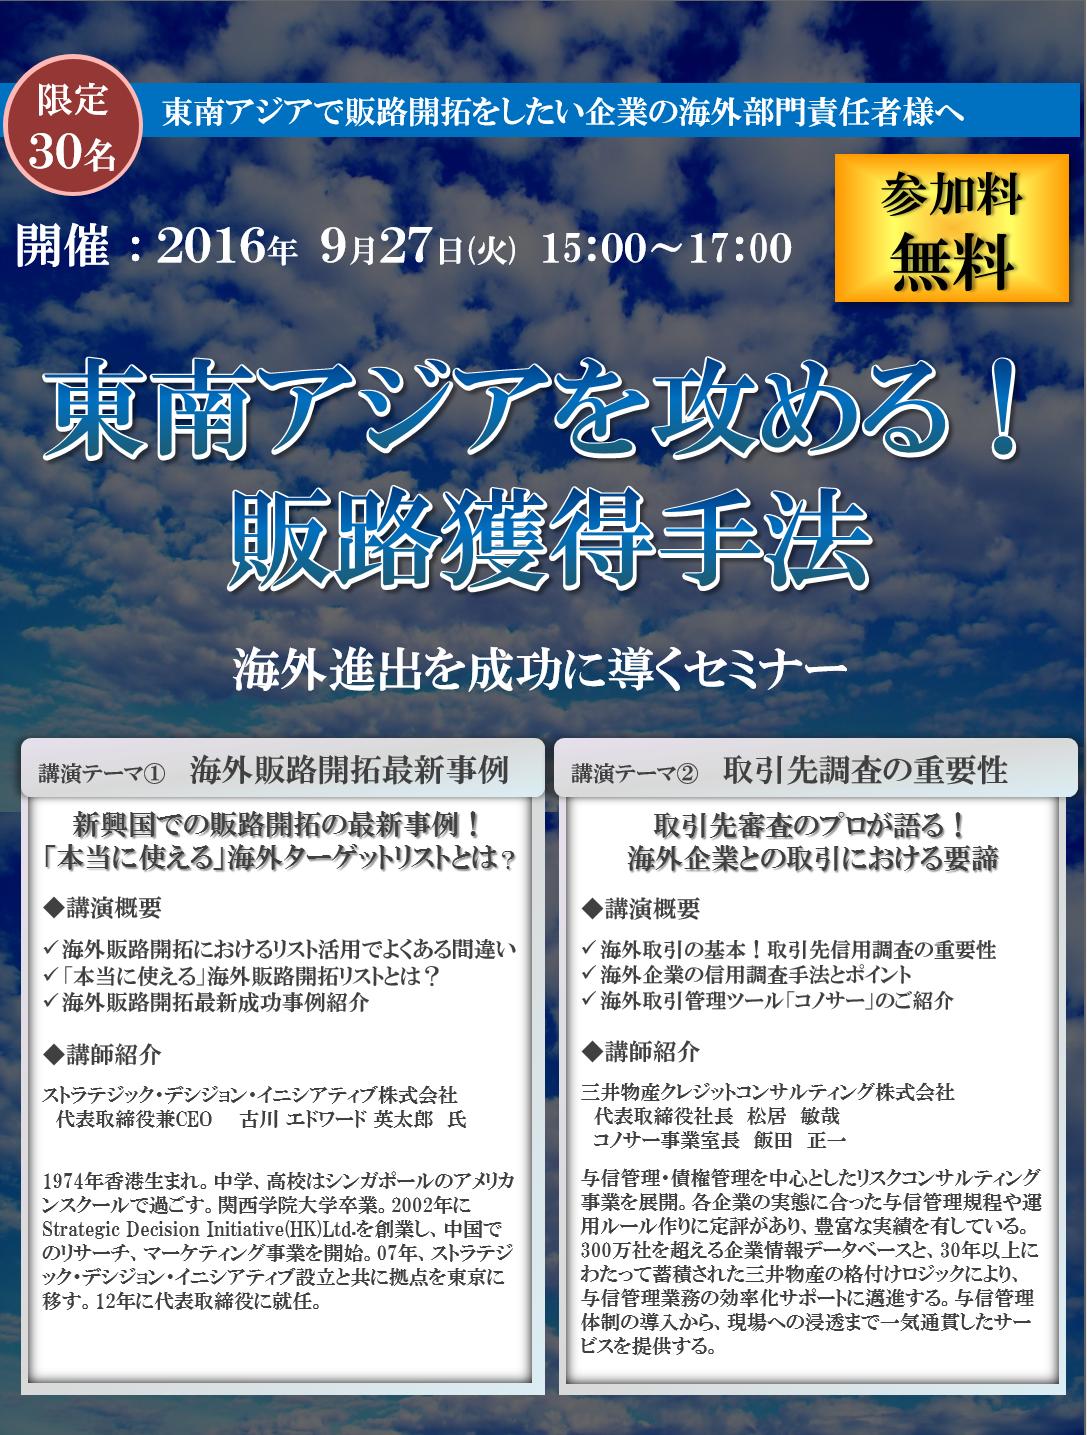 seminar20160927_1